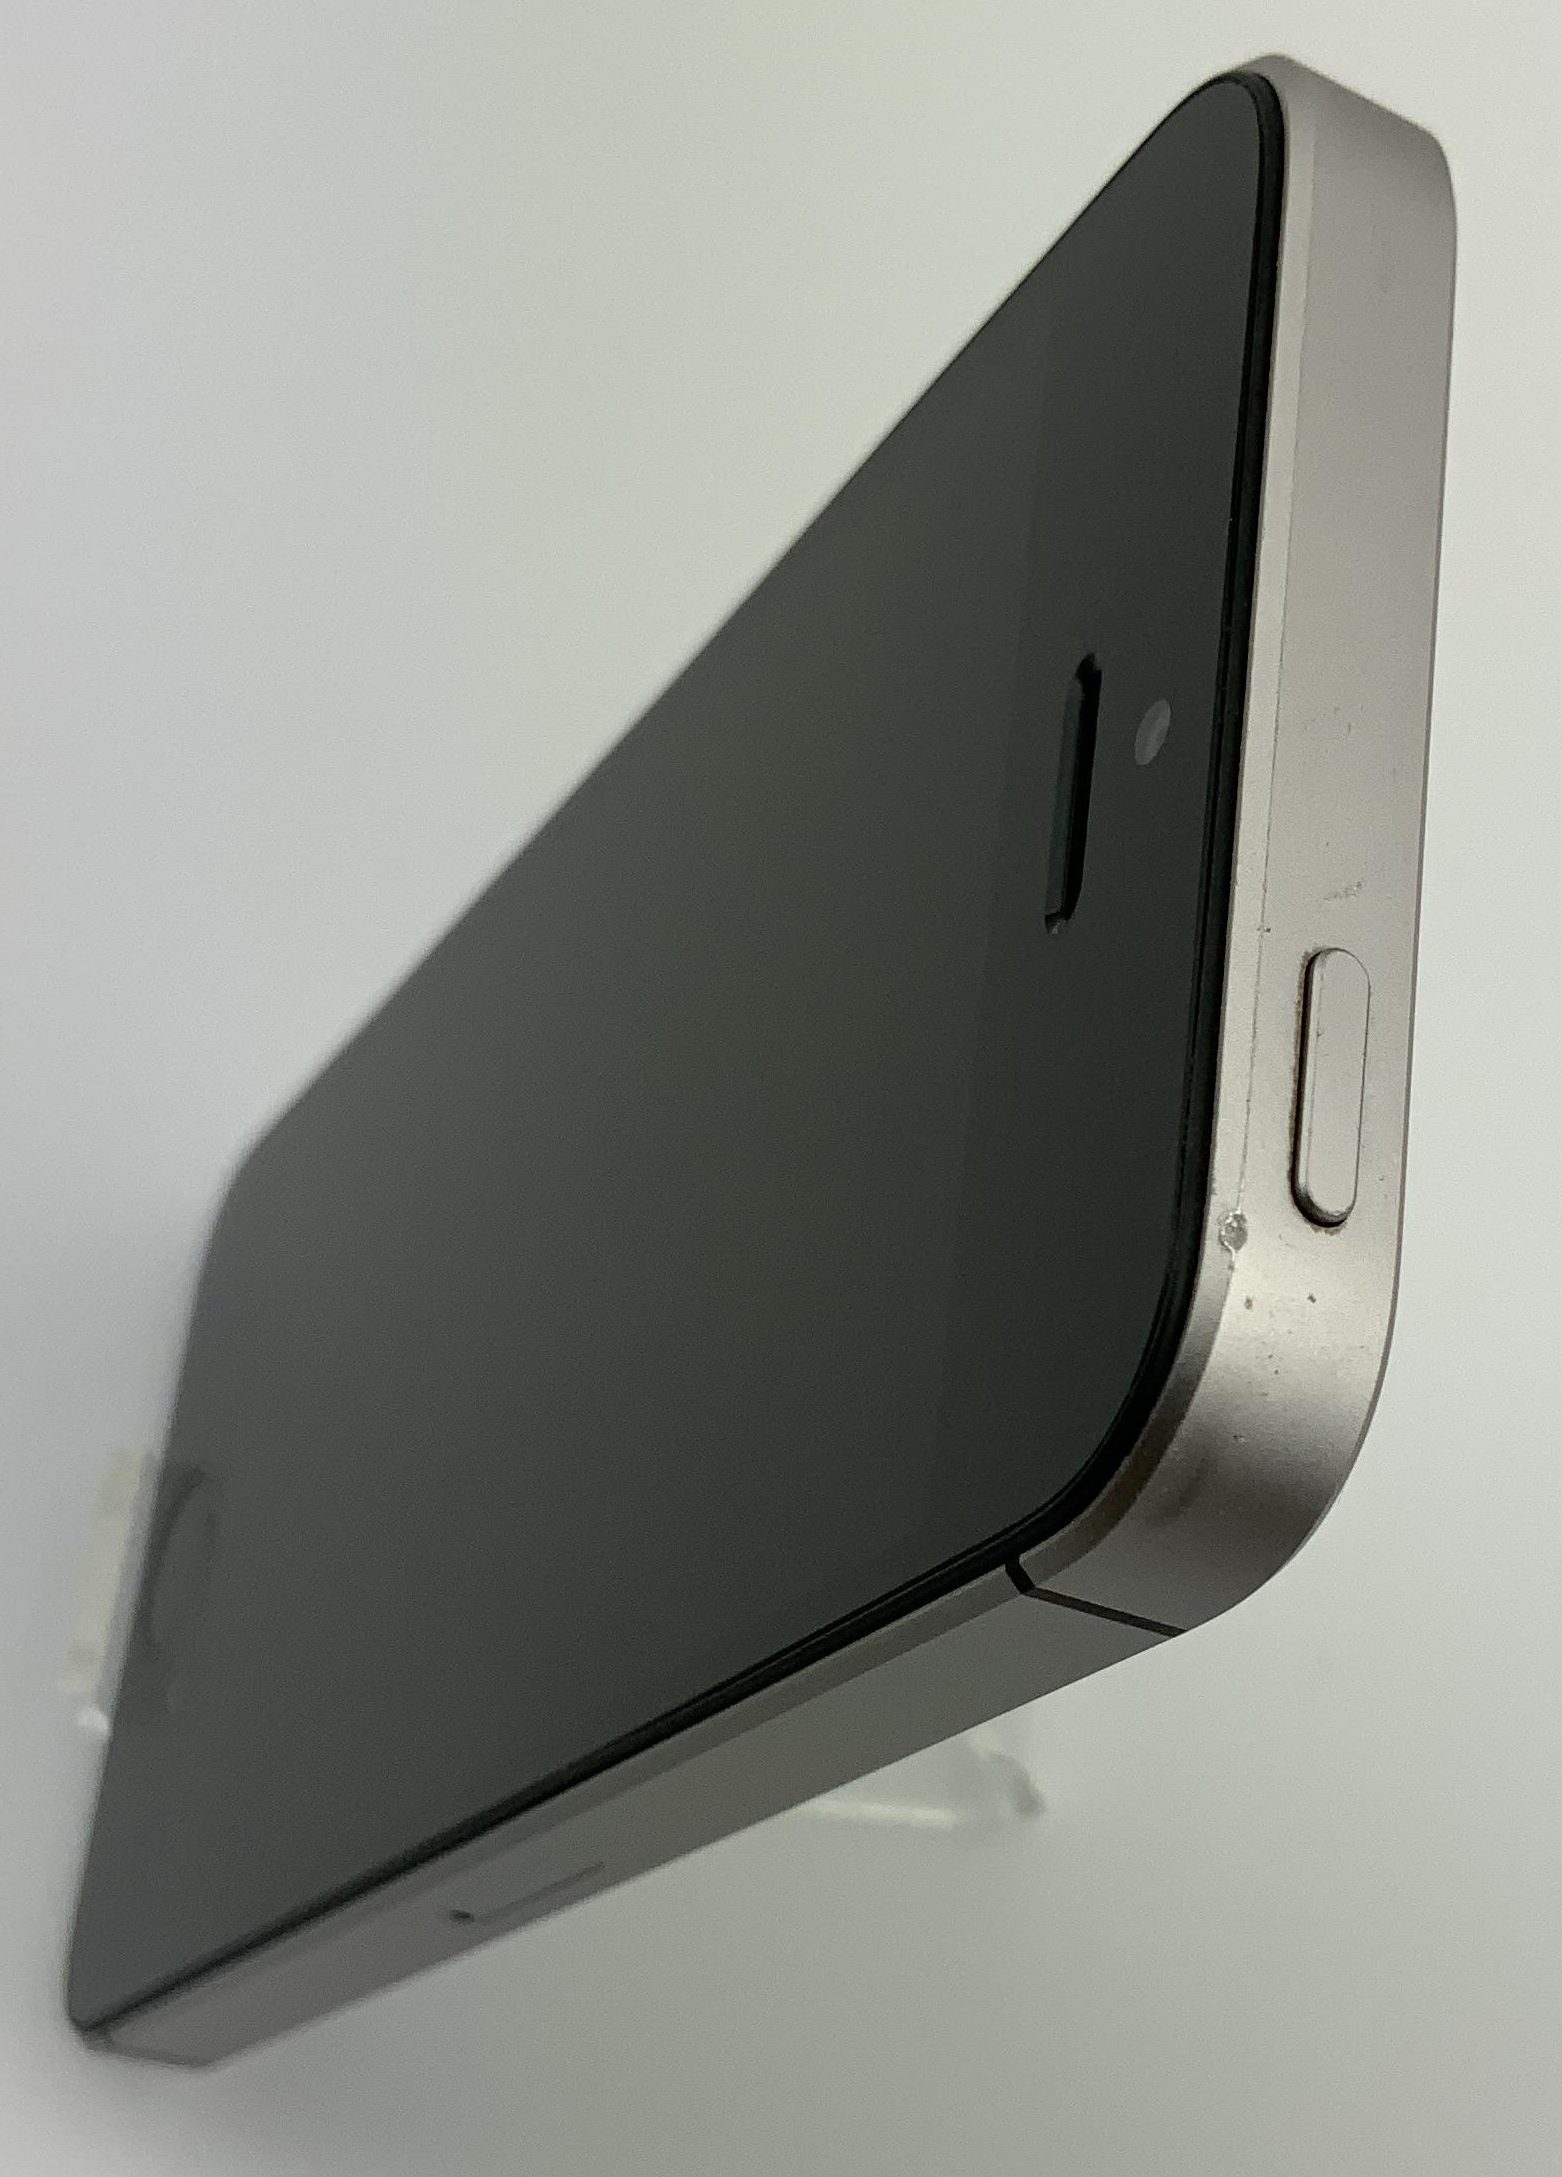 iPhone SE 16GB, 16GB, Space Gray, Kuva 3